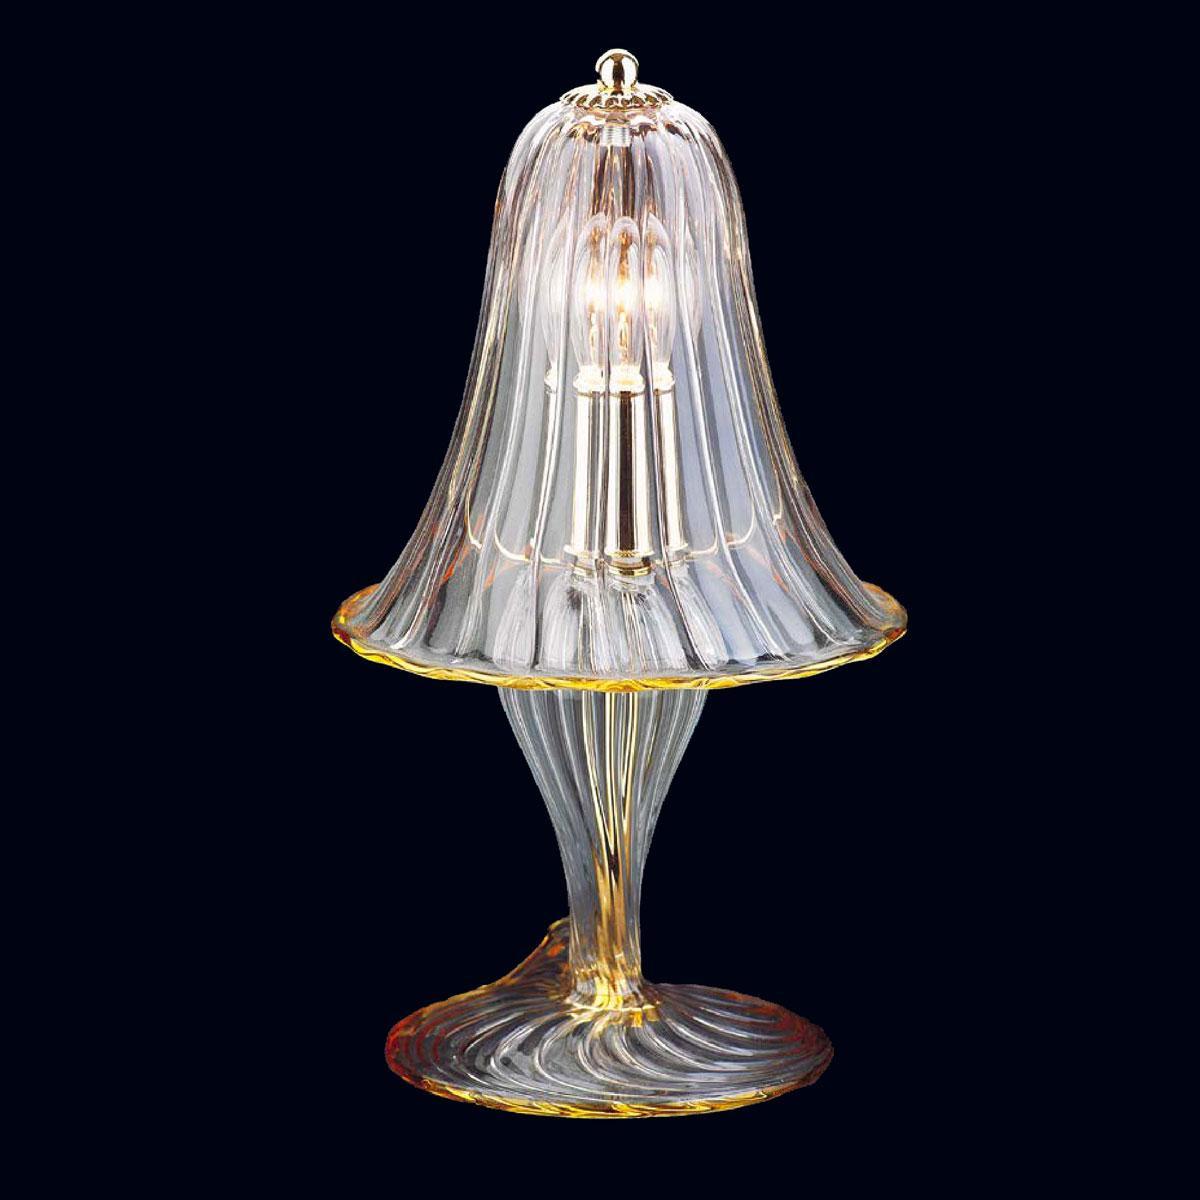 """Osiride"" Murano glass table lamp - 1 light - transparent and amber"